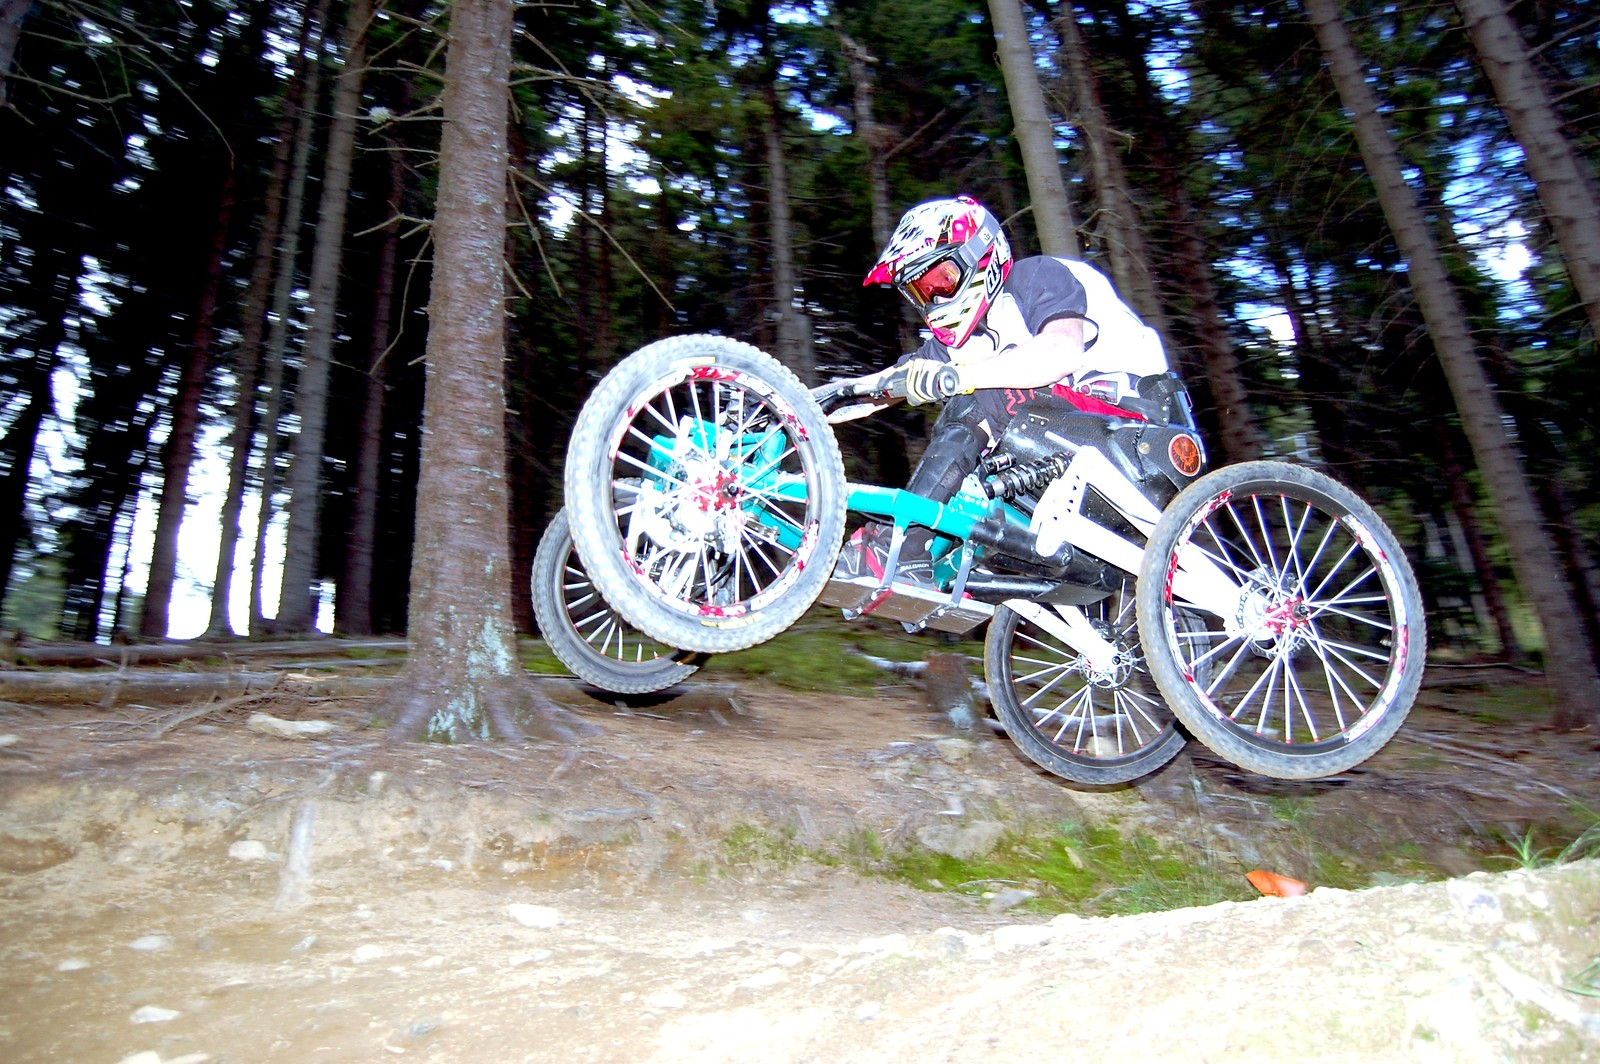 DSC 0020u - wozikmajkl83 - Mountain Biking Pictures - Vital MTB